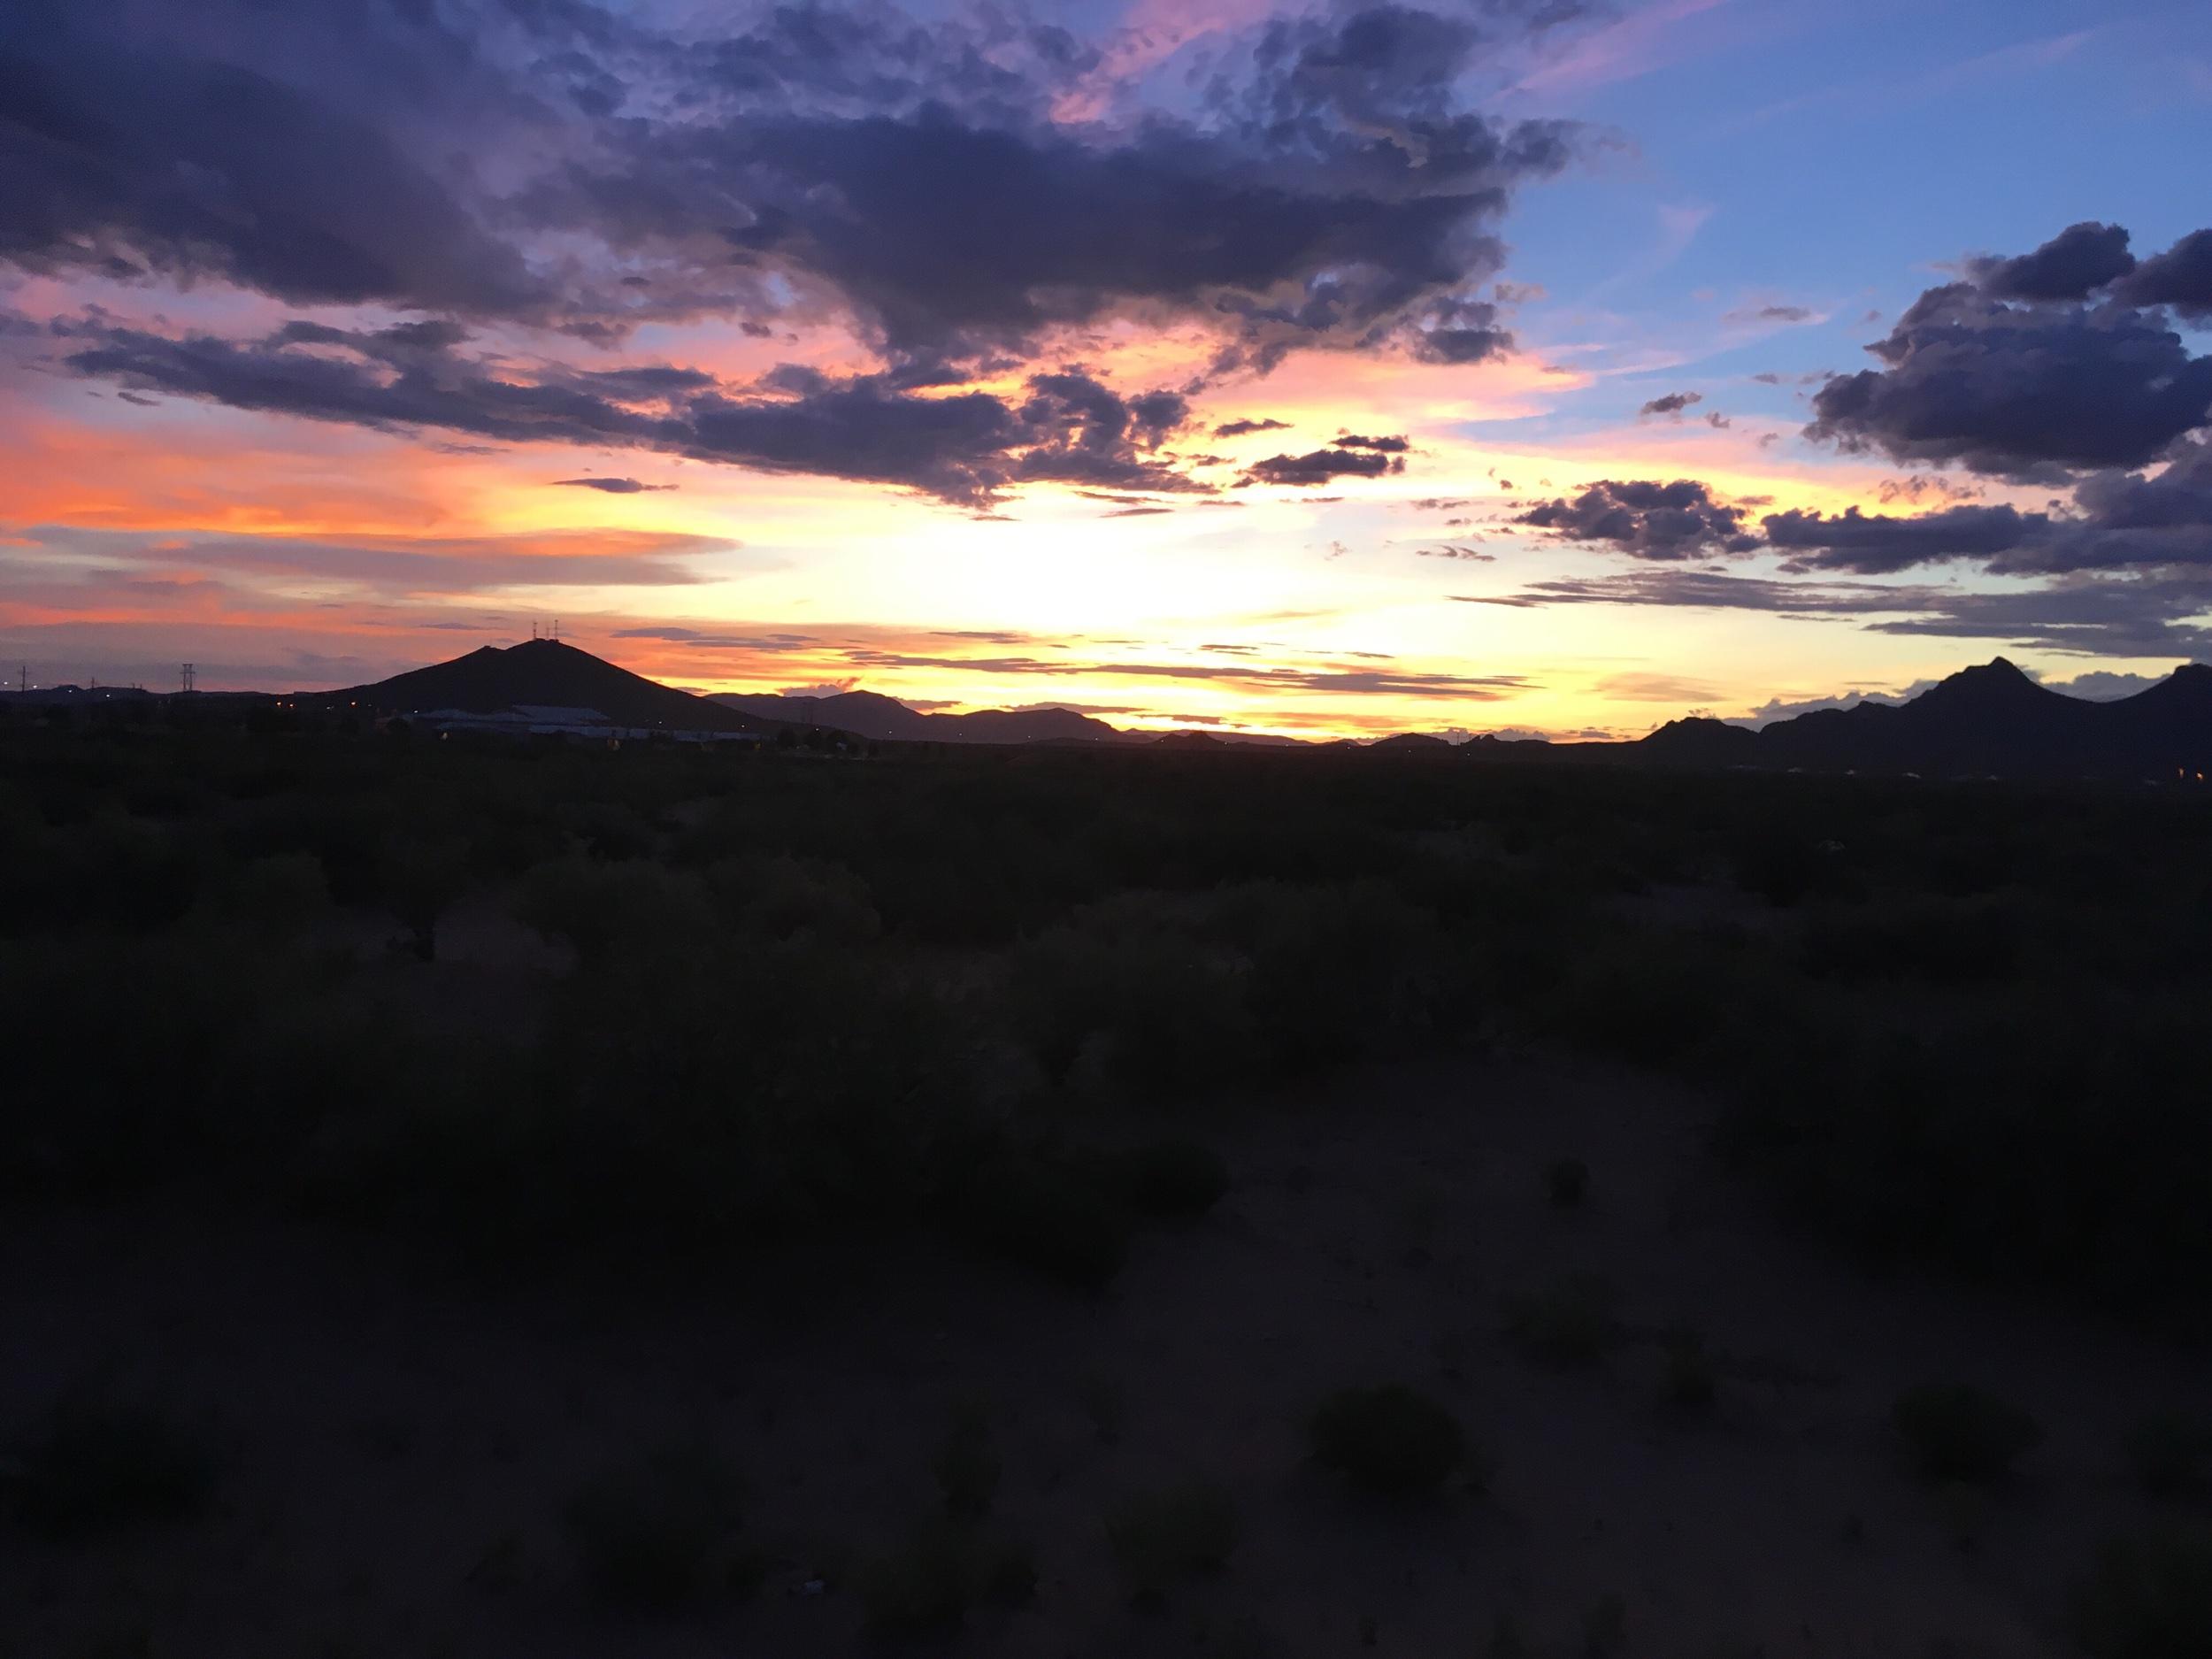 Sunset over Organ Mountains